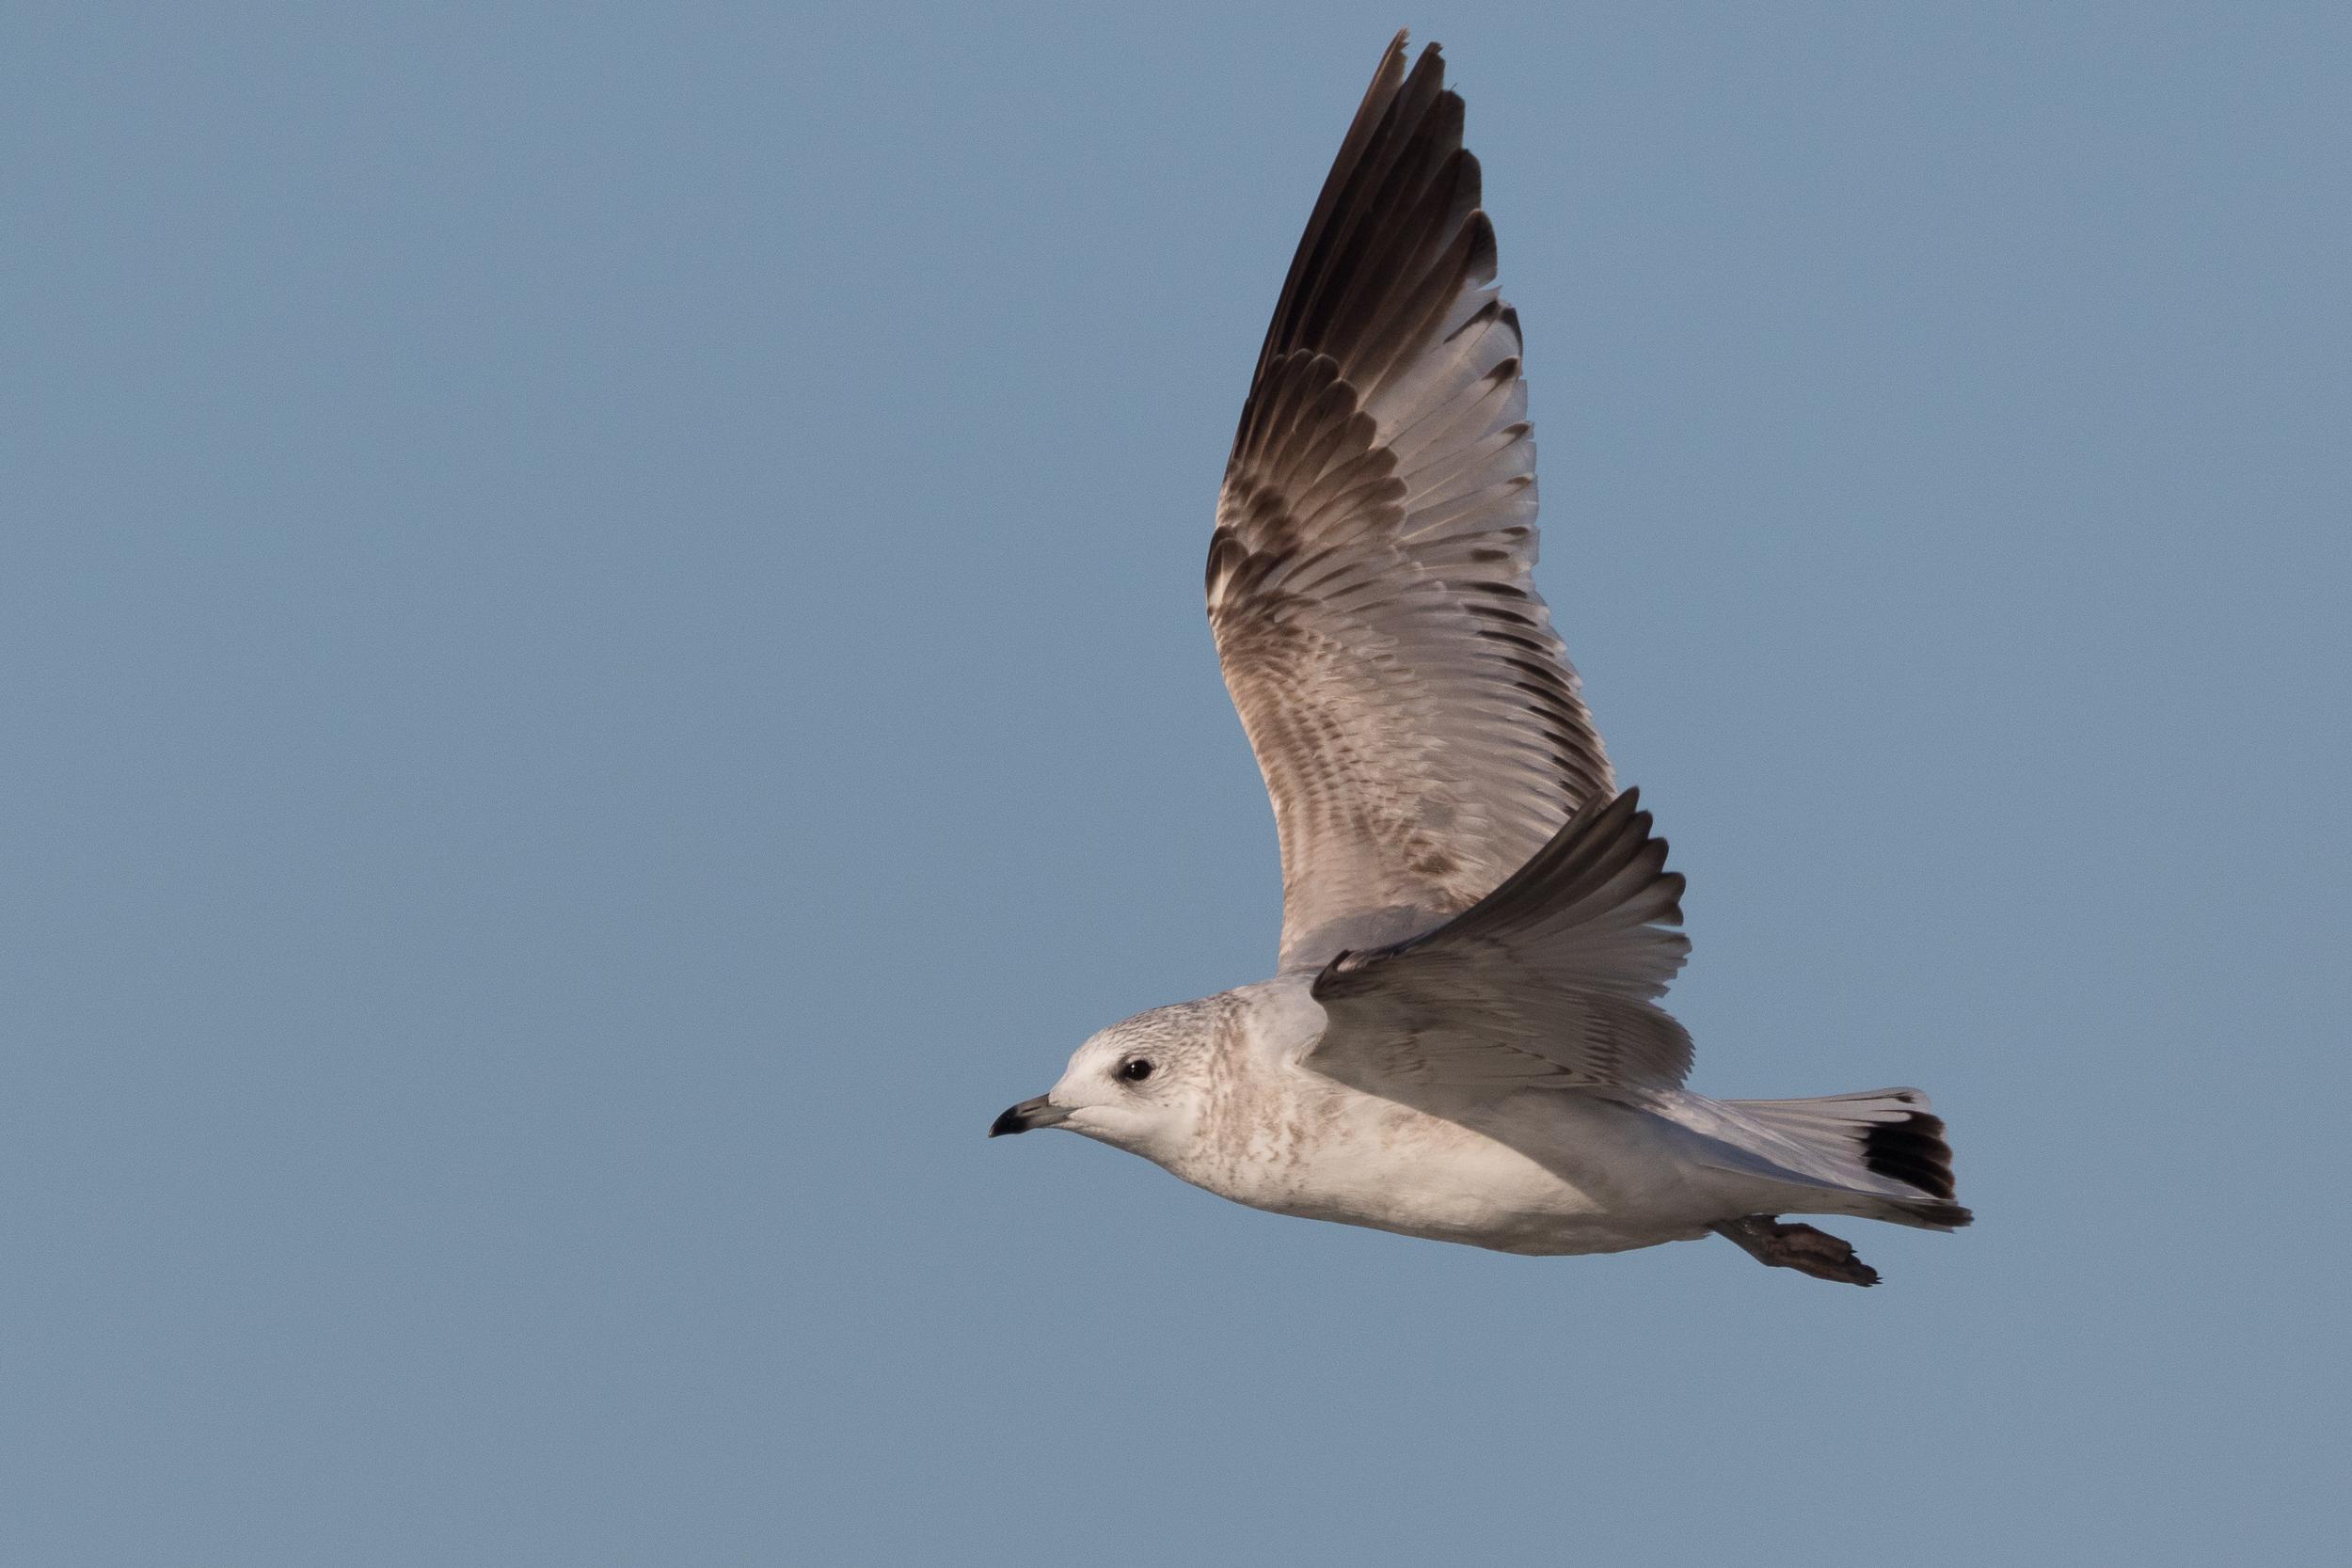 20170124-Common Gull 2CY-28.jpg